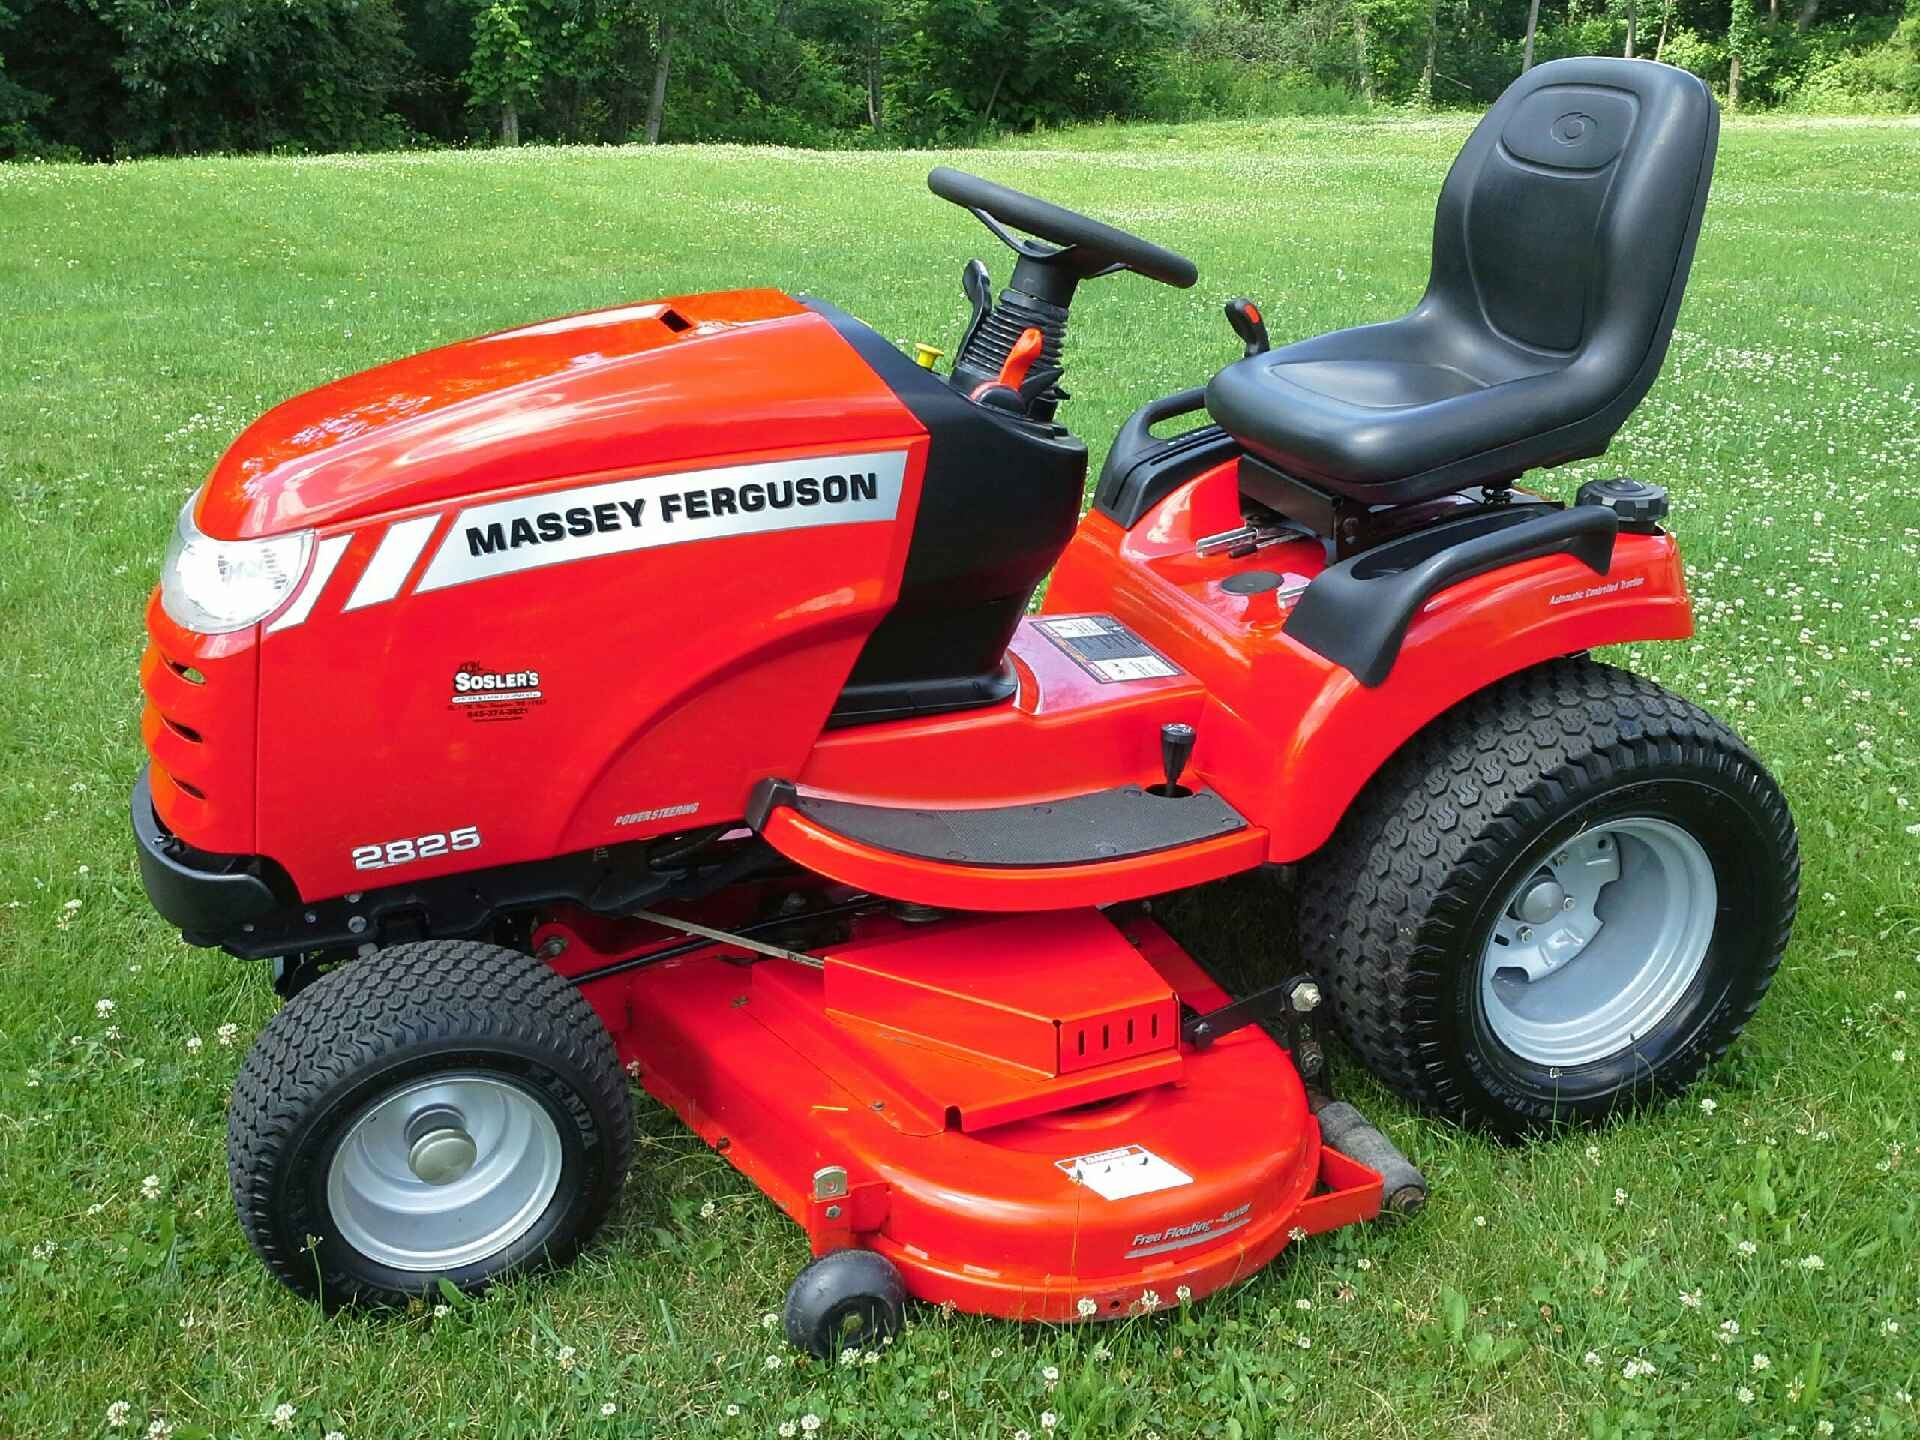 2008 Massey Ferguson 2825H Garden Tractor